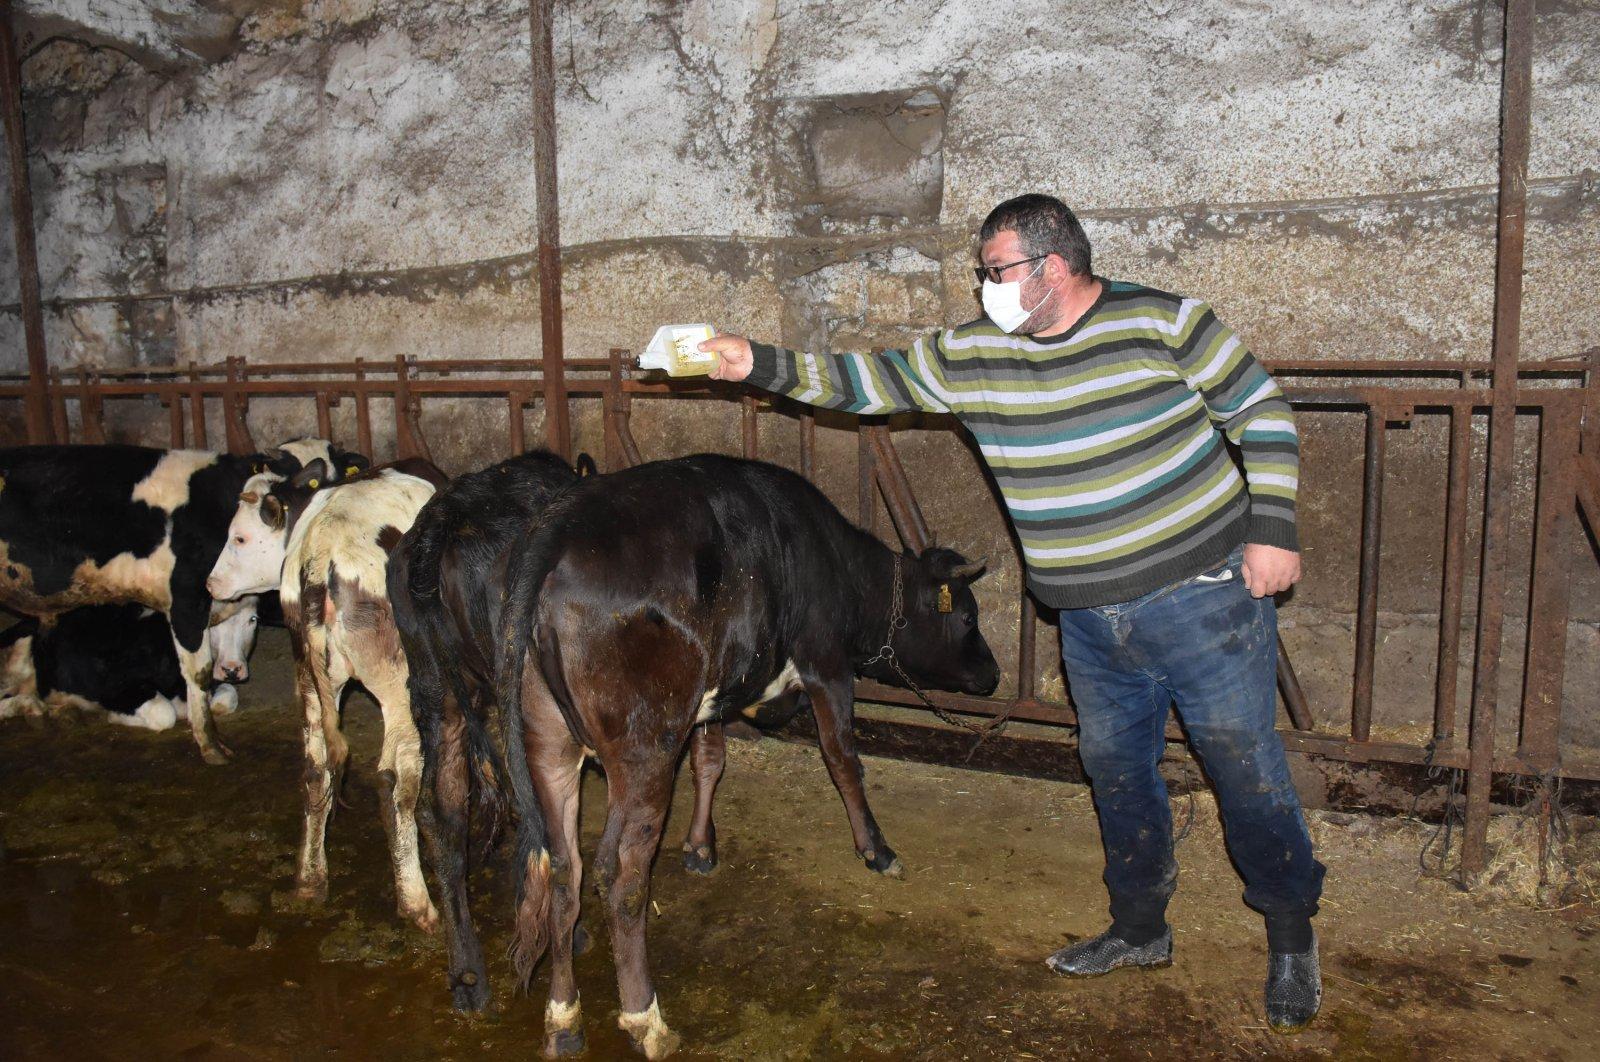 A man sprays a pesticide against ticks on cattle in Sivas, Turkey, June 4, 2020. (DHA Photo)